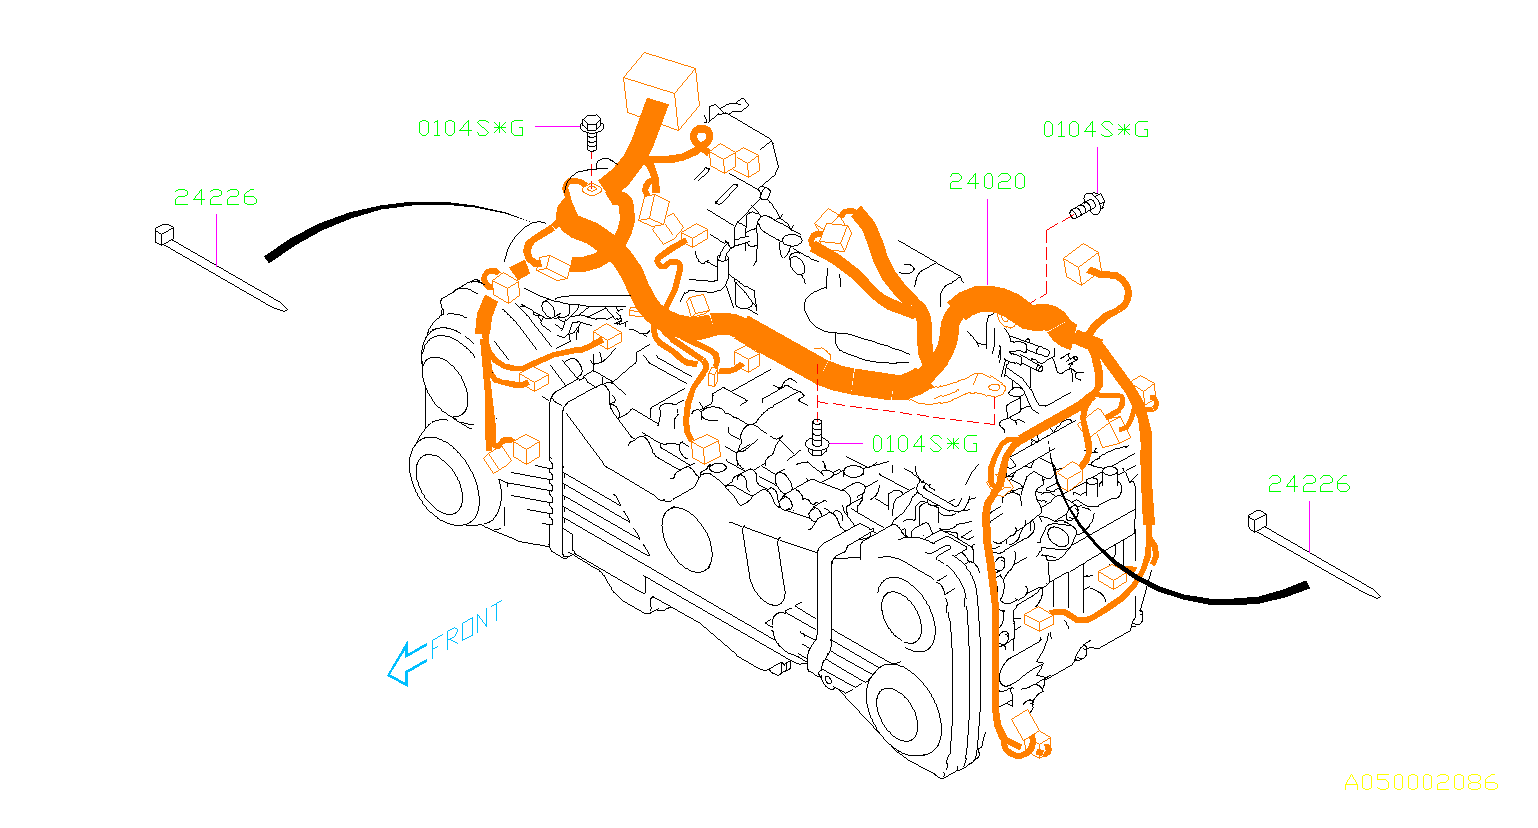 Subaru Wrx Engine Wiring Harness  Wiring Harness Used For